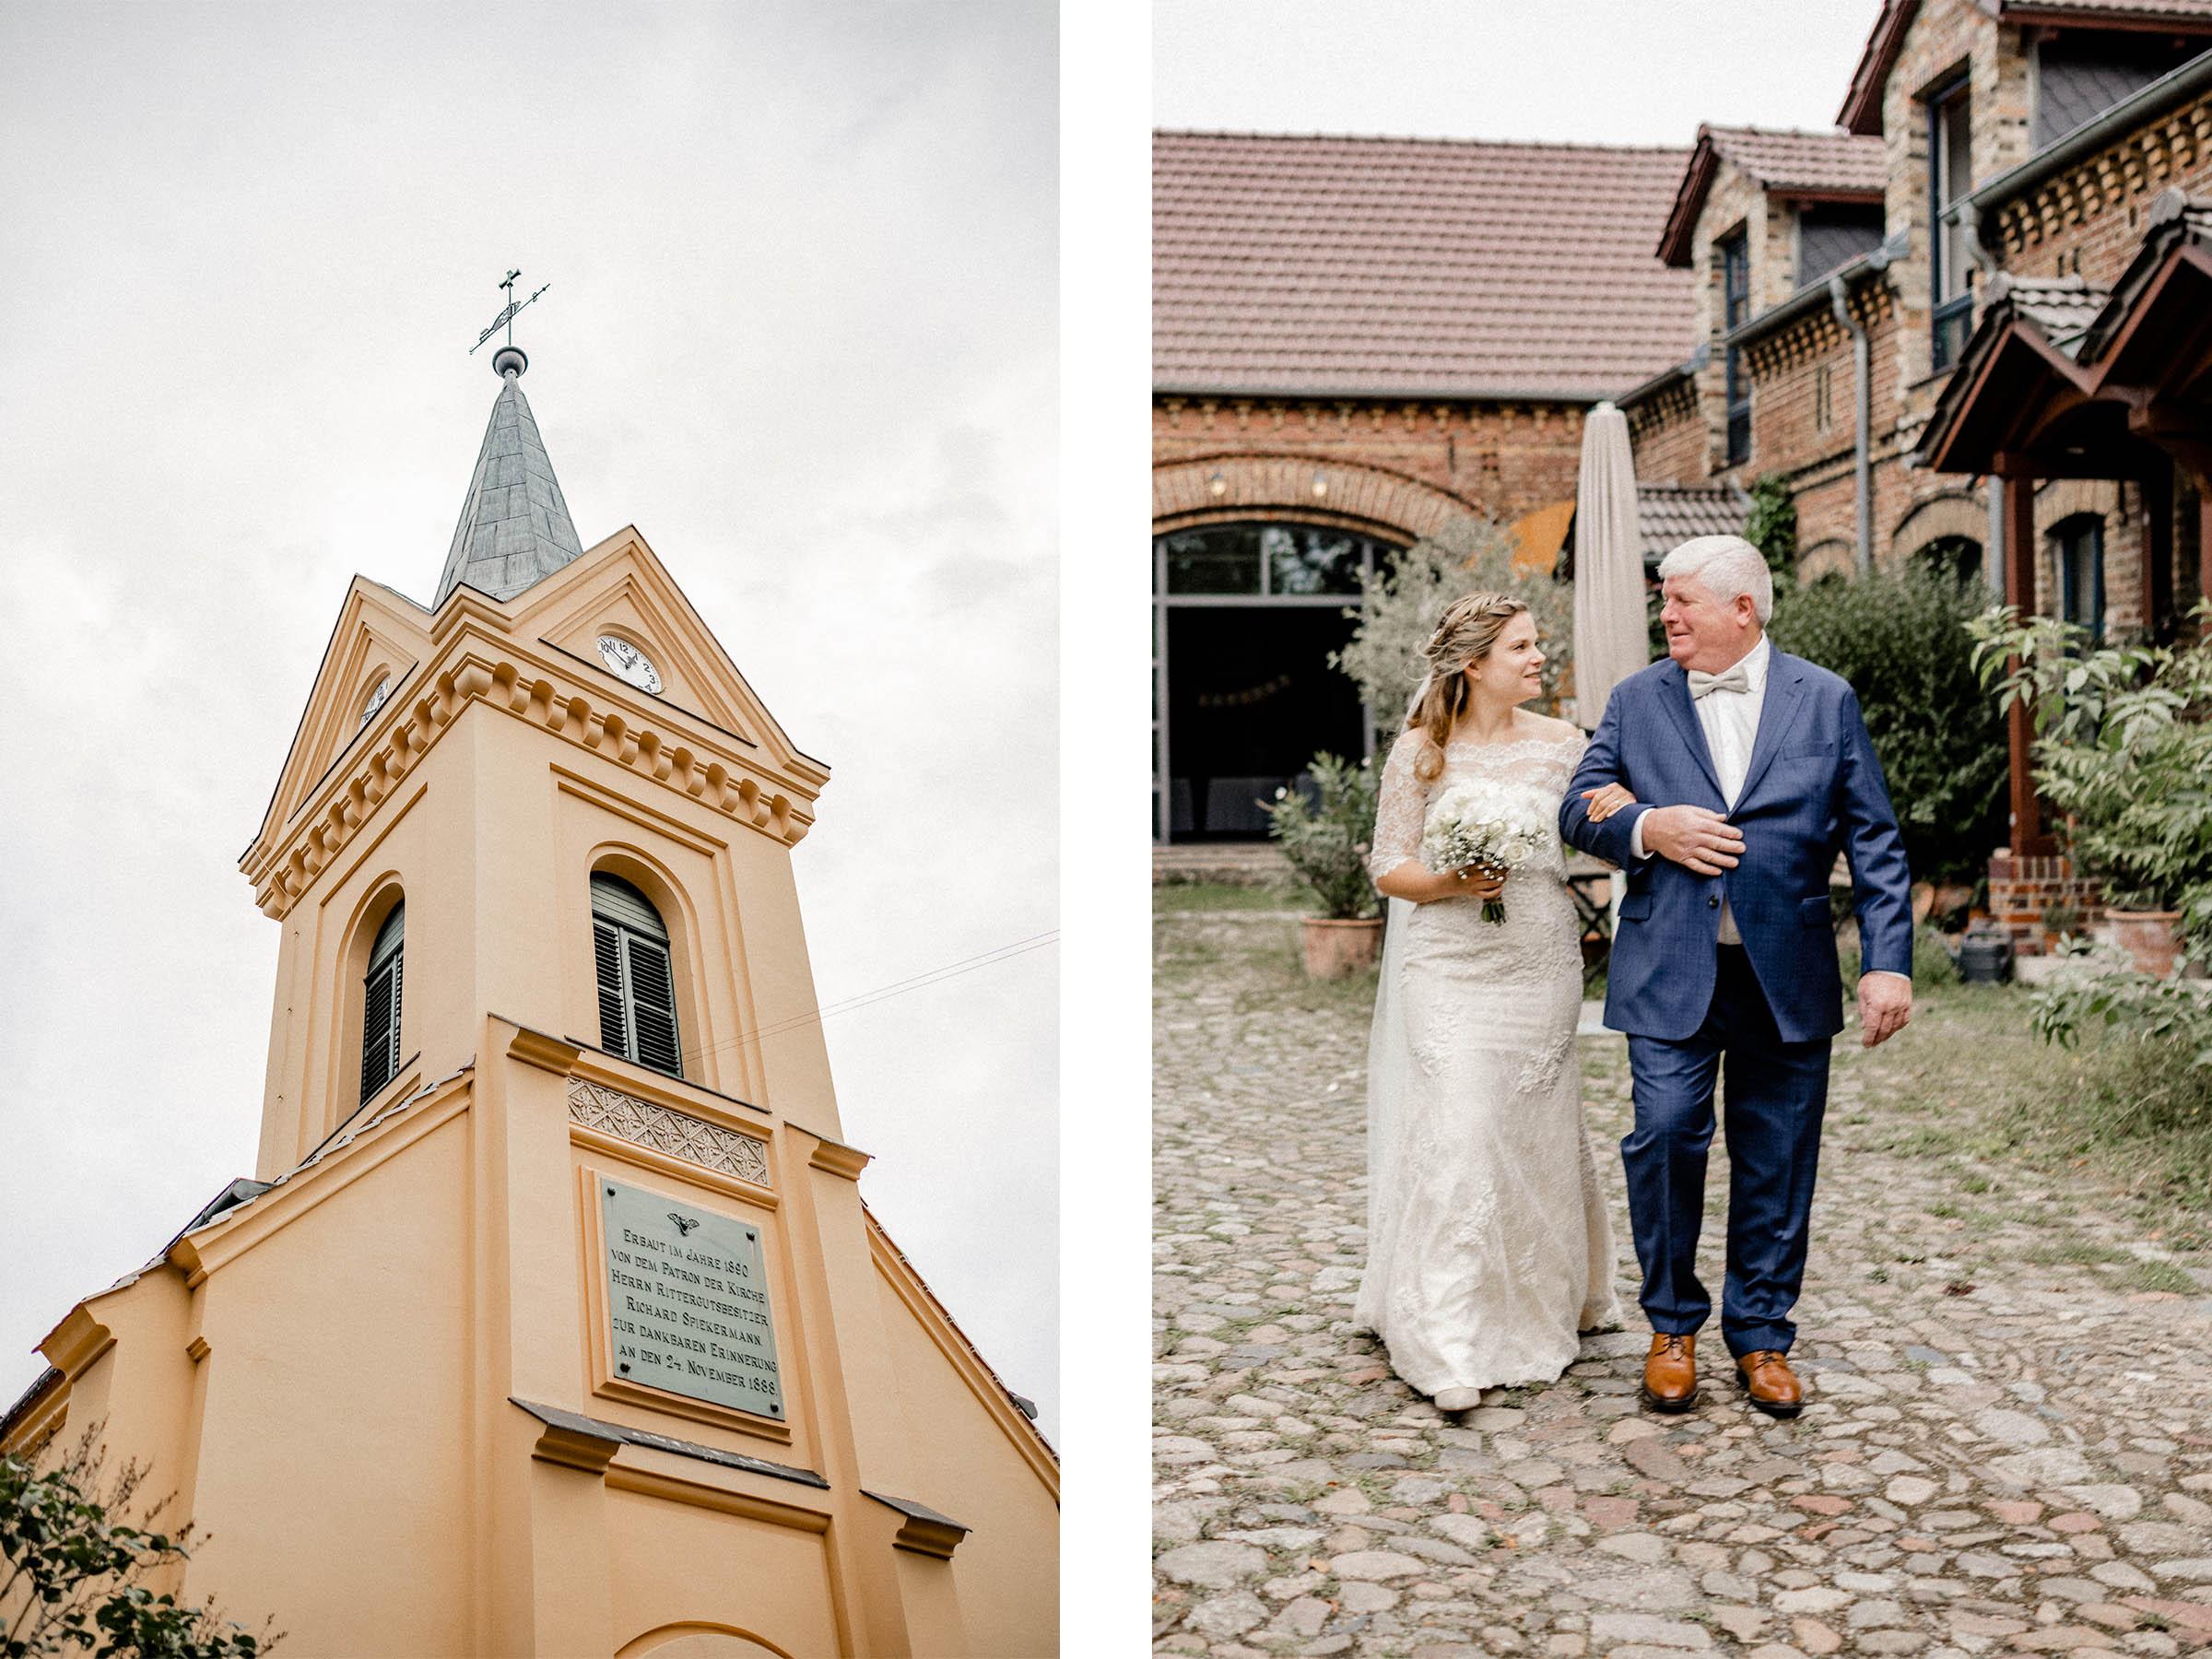 Virginia-Pech-Fotografie-Hochzeitsfotograf-Hochzeitsfotografie-Kulturscheune-Rangsdorf-Berlin-Anika-Nico-23